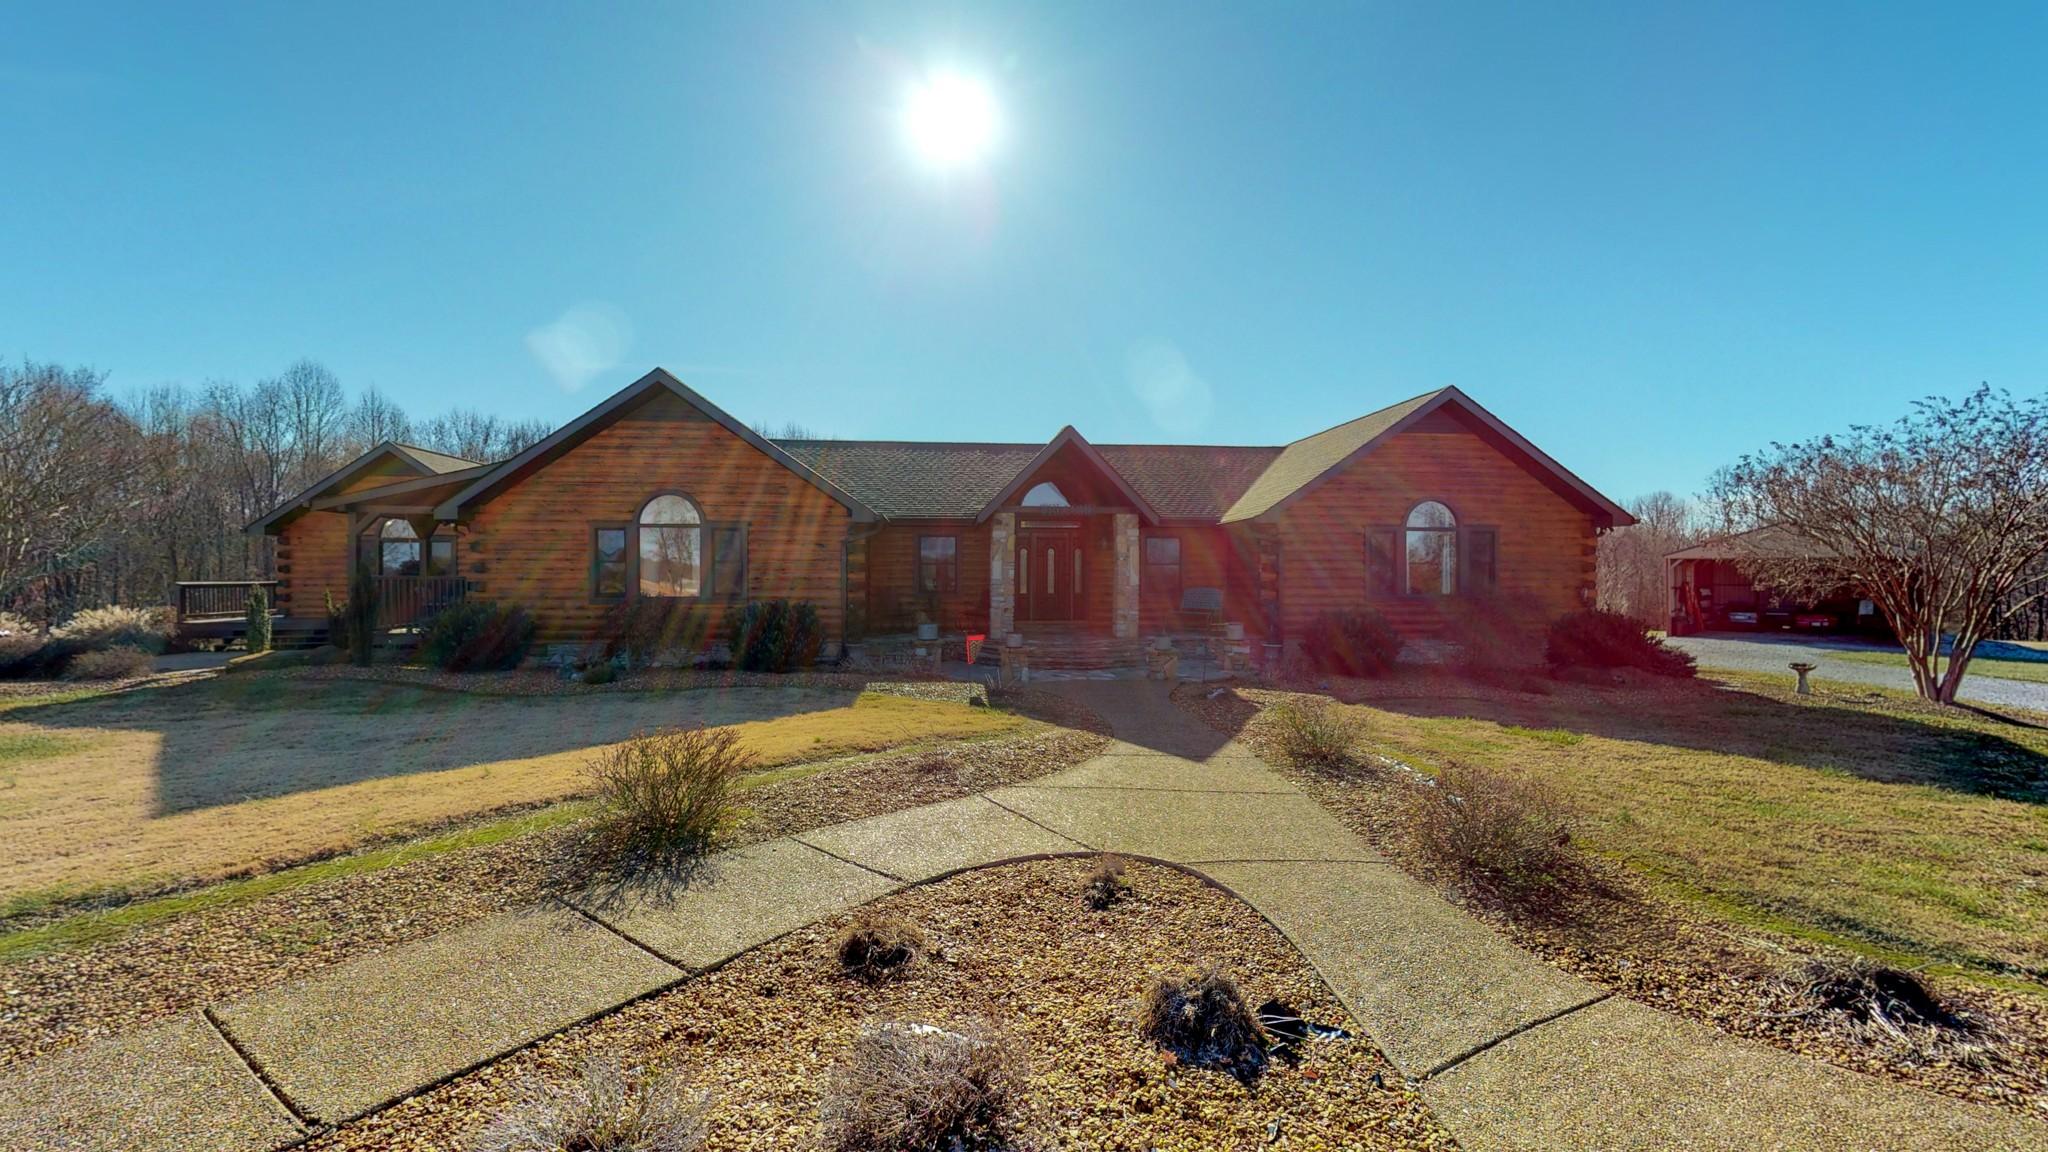 6743 Bethlehem Rd, Springfield, TN 37172 - Springfield, TN real estate listing